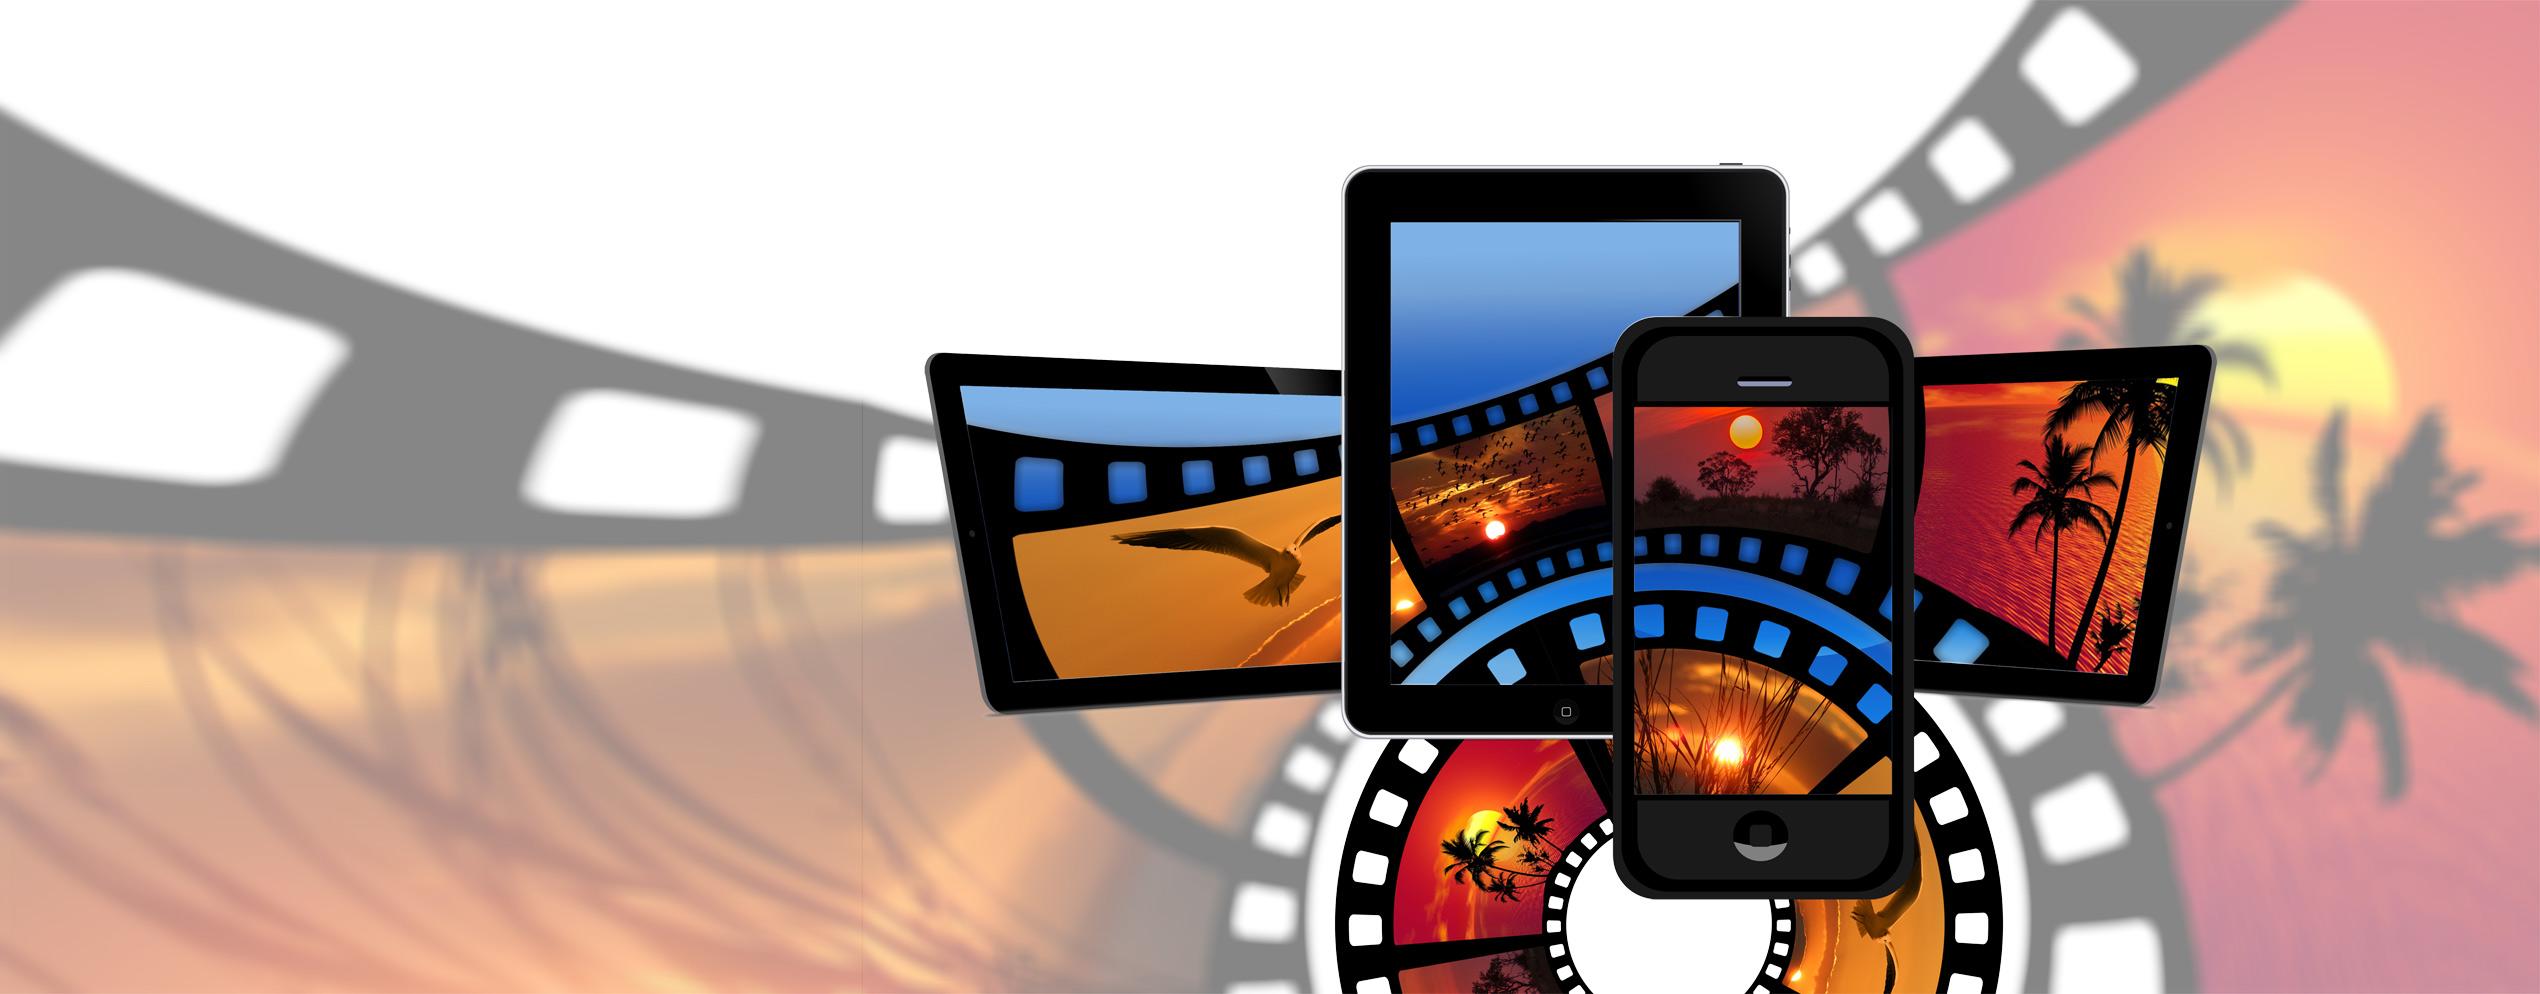 pixabay-geralt-film-2643100-2540x1000-HEADER